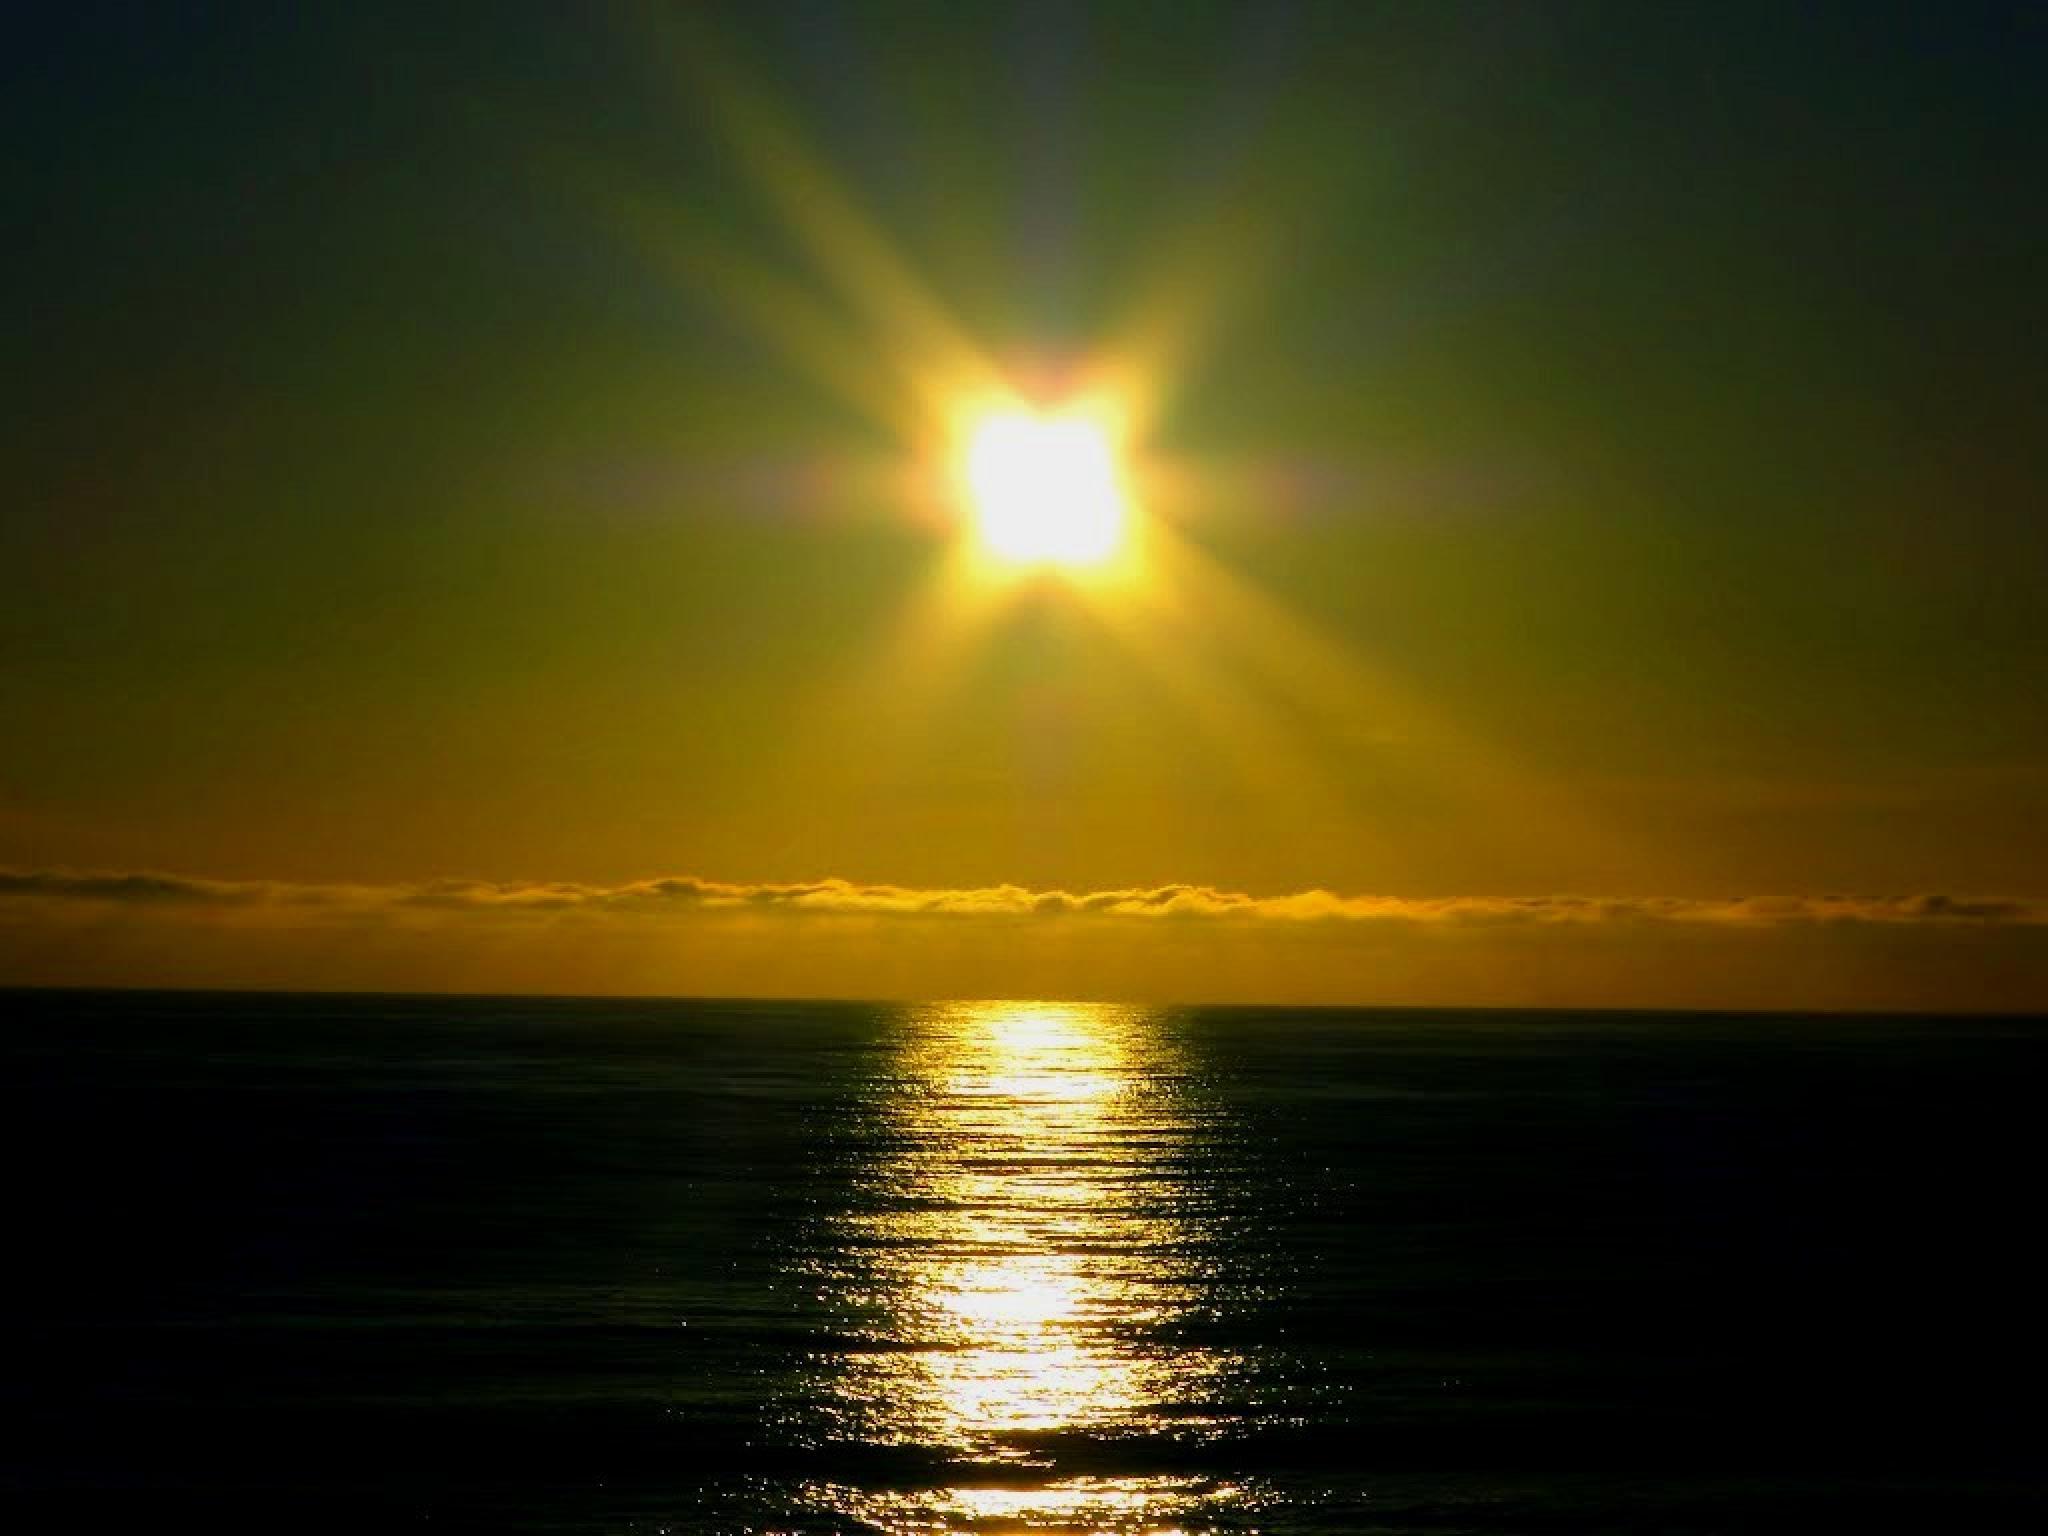 Sunset in Atlantic Ocean, Uruguay by Joselito Nardy Ribeiro